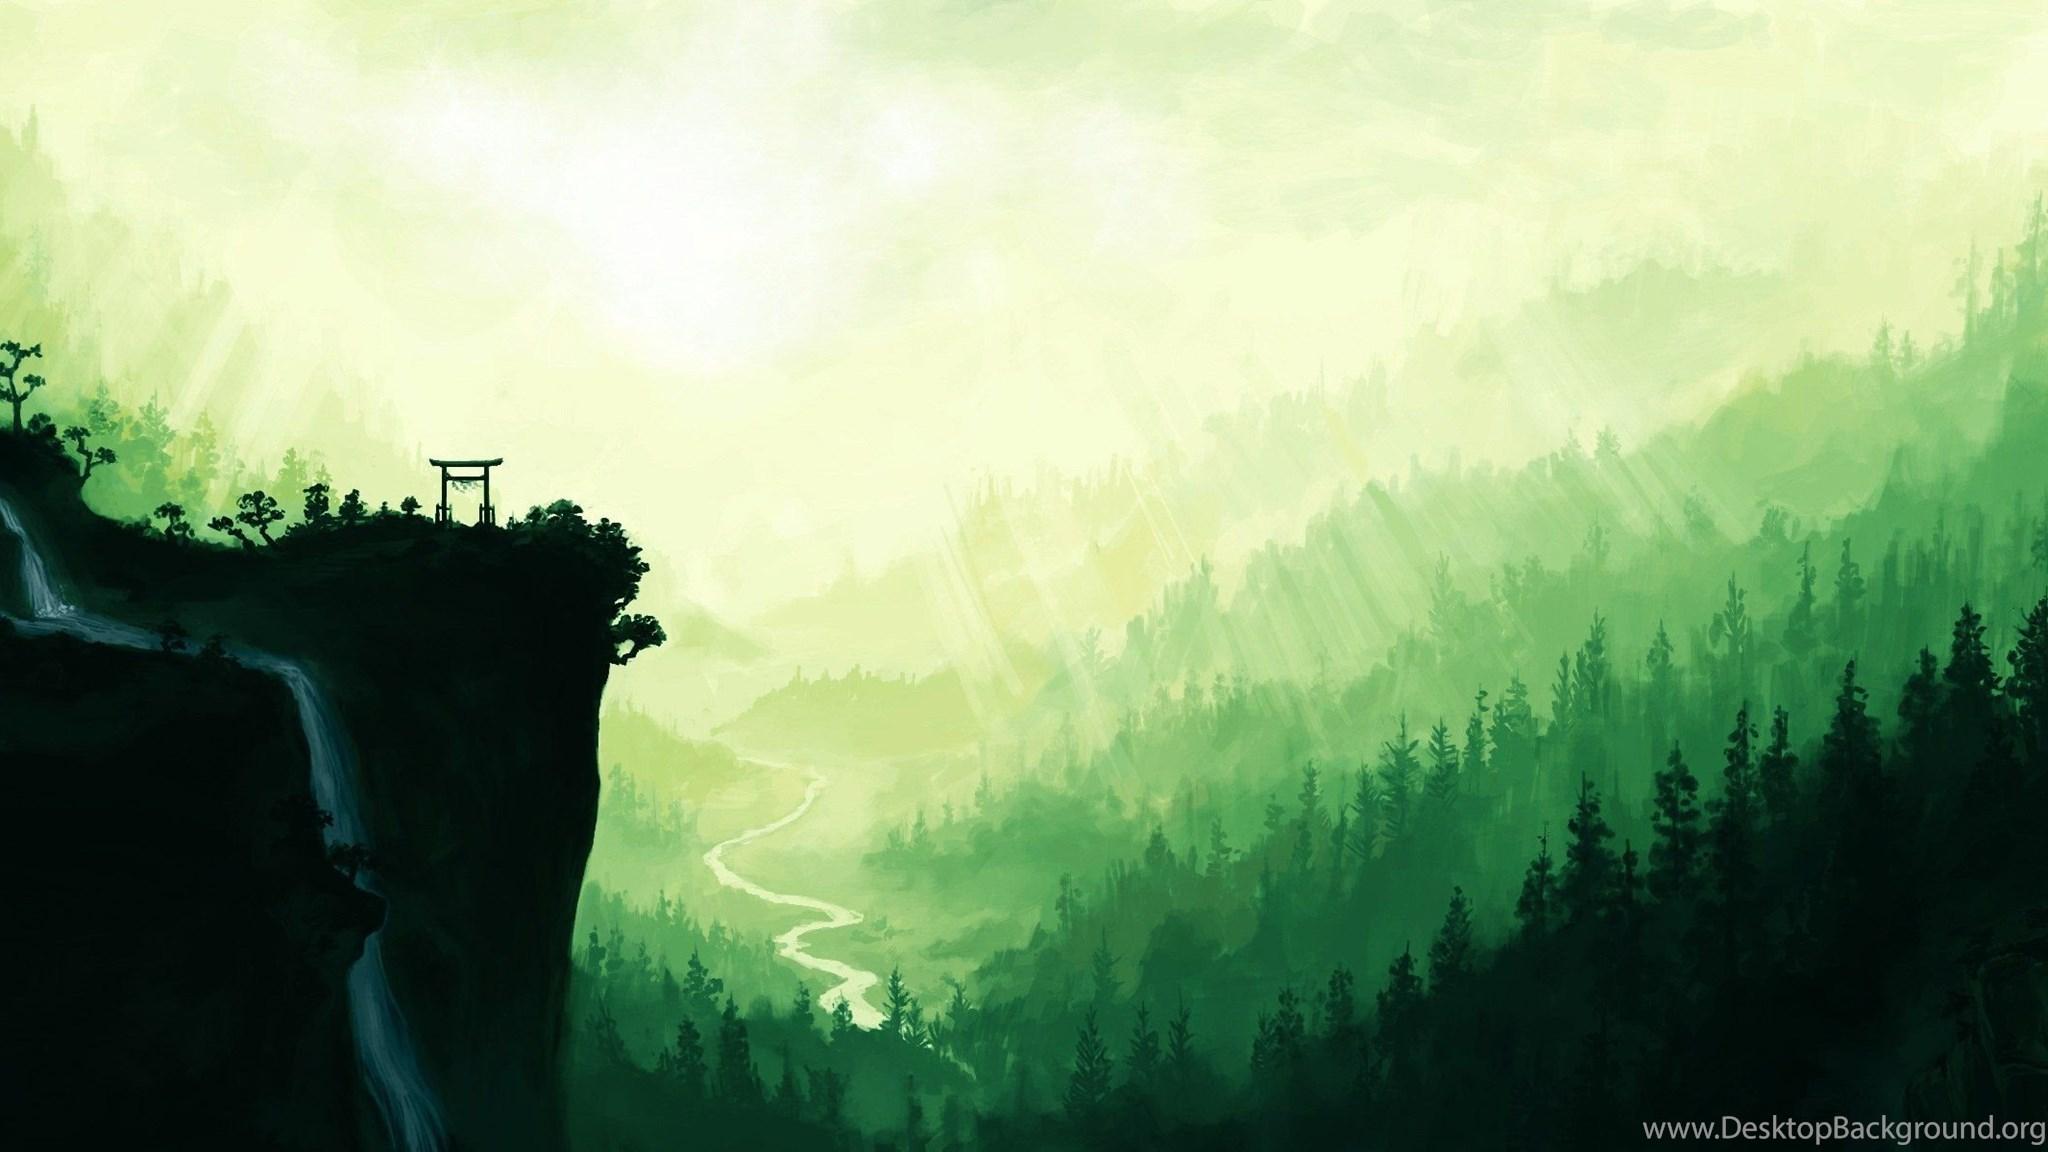 Prostranstva Gengo Mango 79421_anime-scenery-wallpapers-2400x1199_2400x1199_h